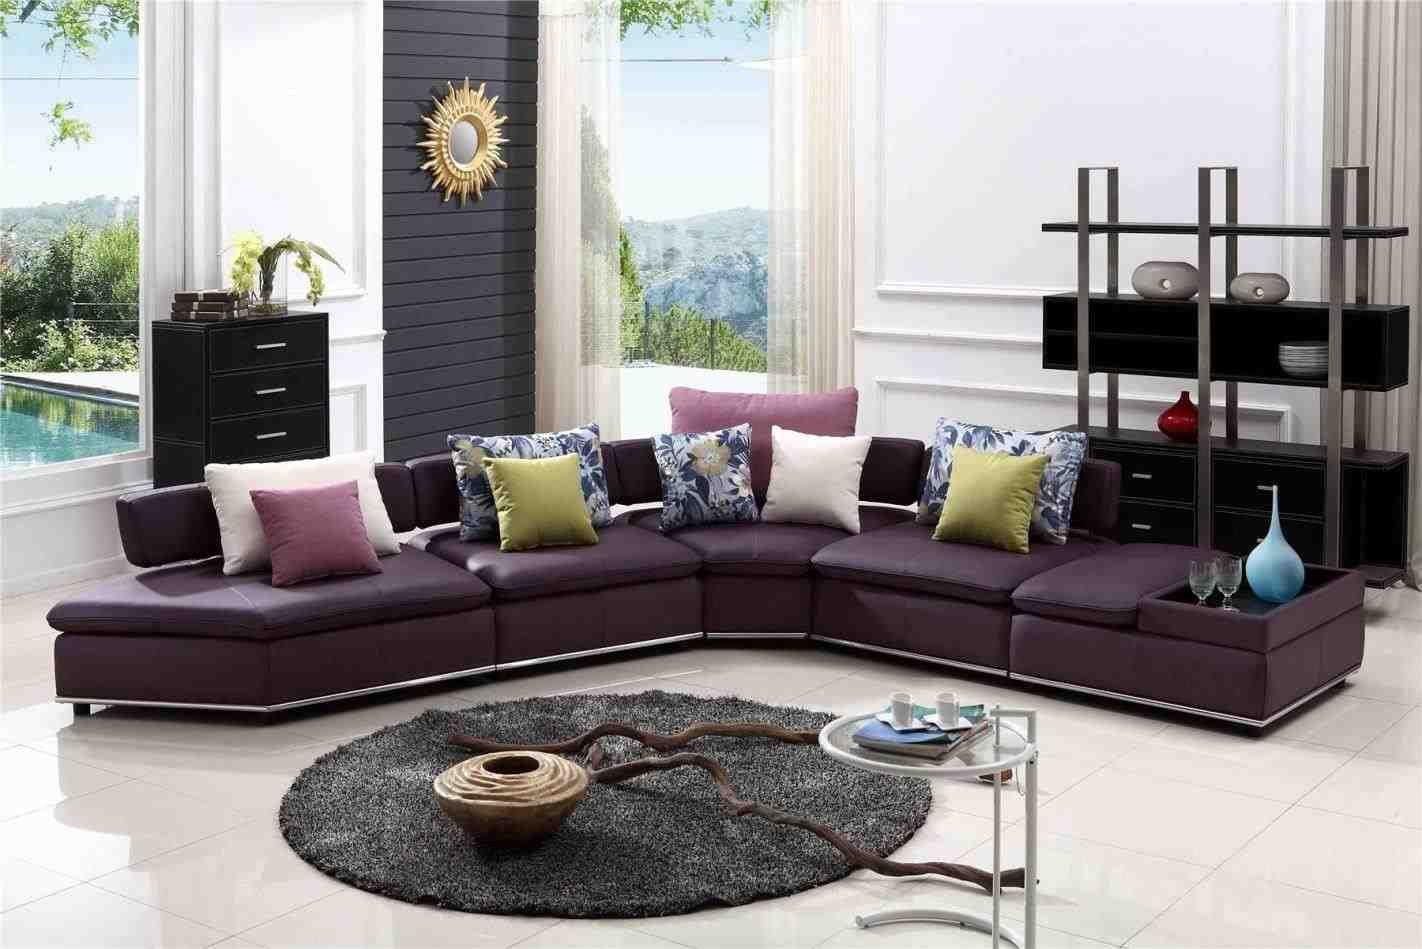 Surprising Cheap Leather Sofas Ebay Blue Sofas Leather Sofa Ebay Machost Co Dining Chair Design Ideas Machostcouk